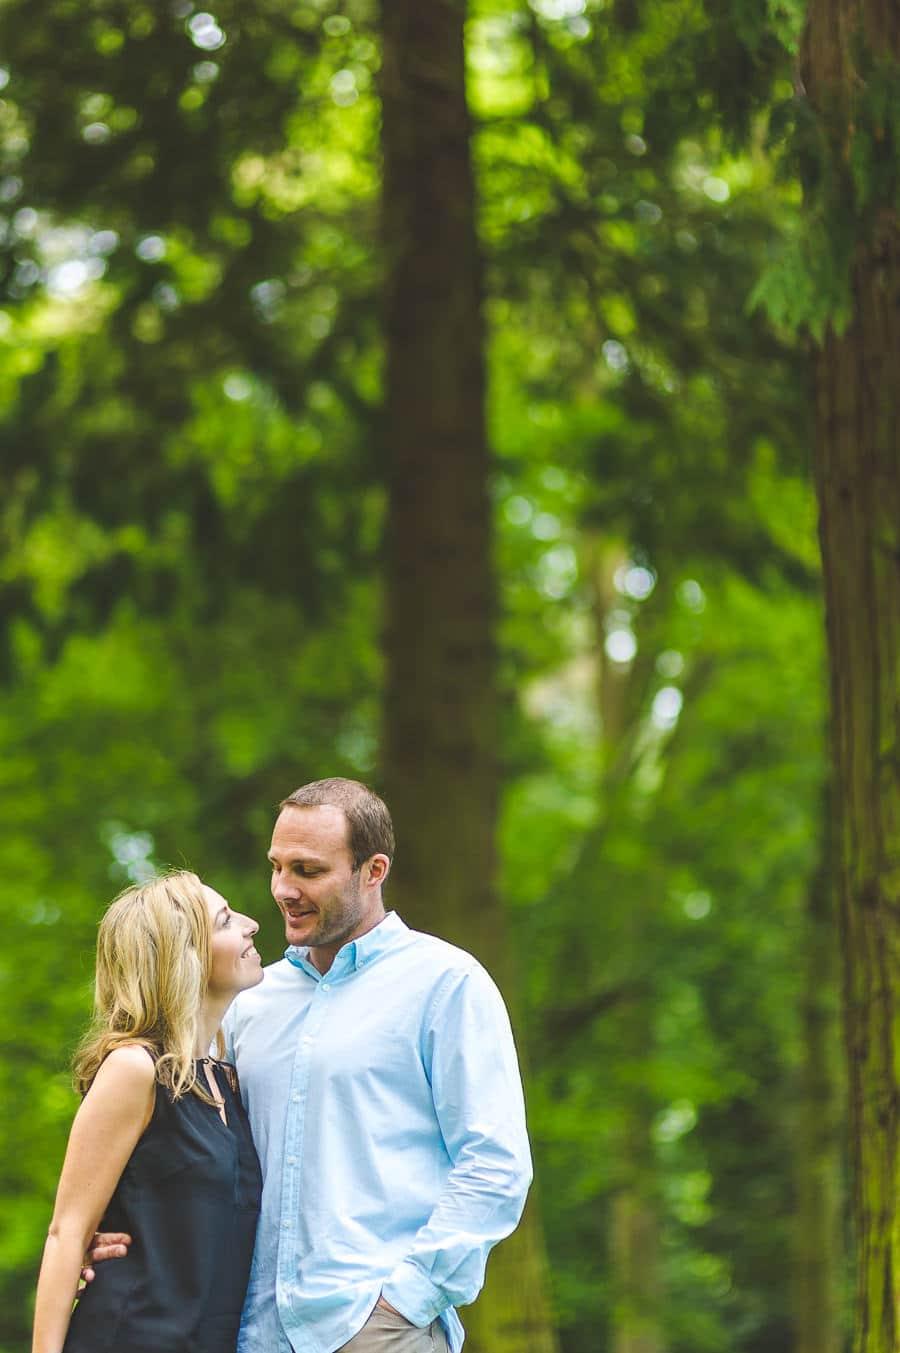 Louise & Nick's Pre Wedding Photography @ Eastnor Castle Ledbury | Herefordshire Photographers 31